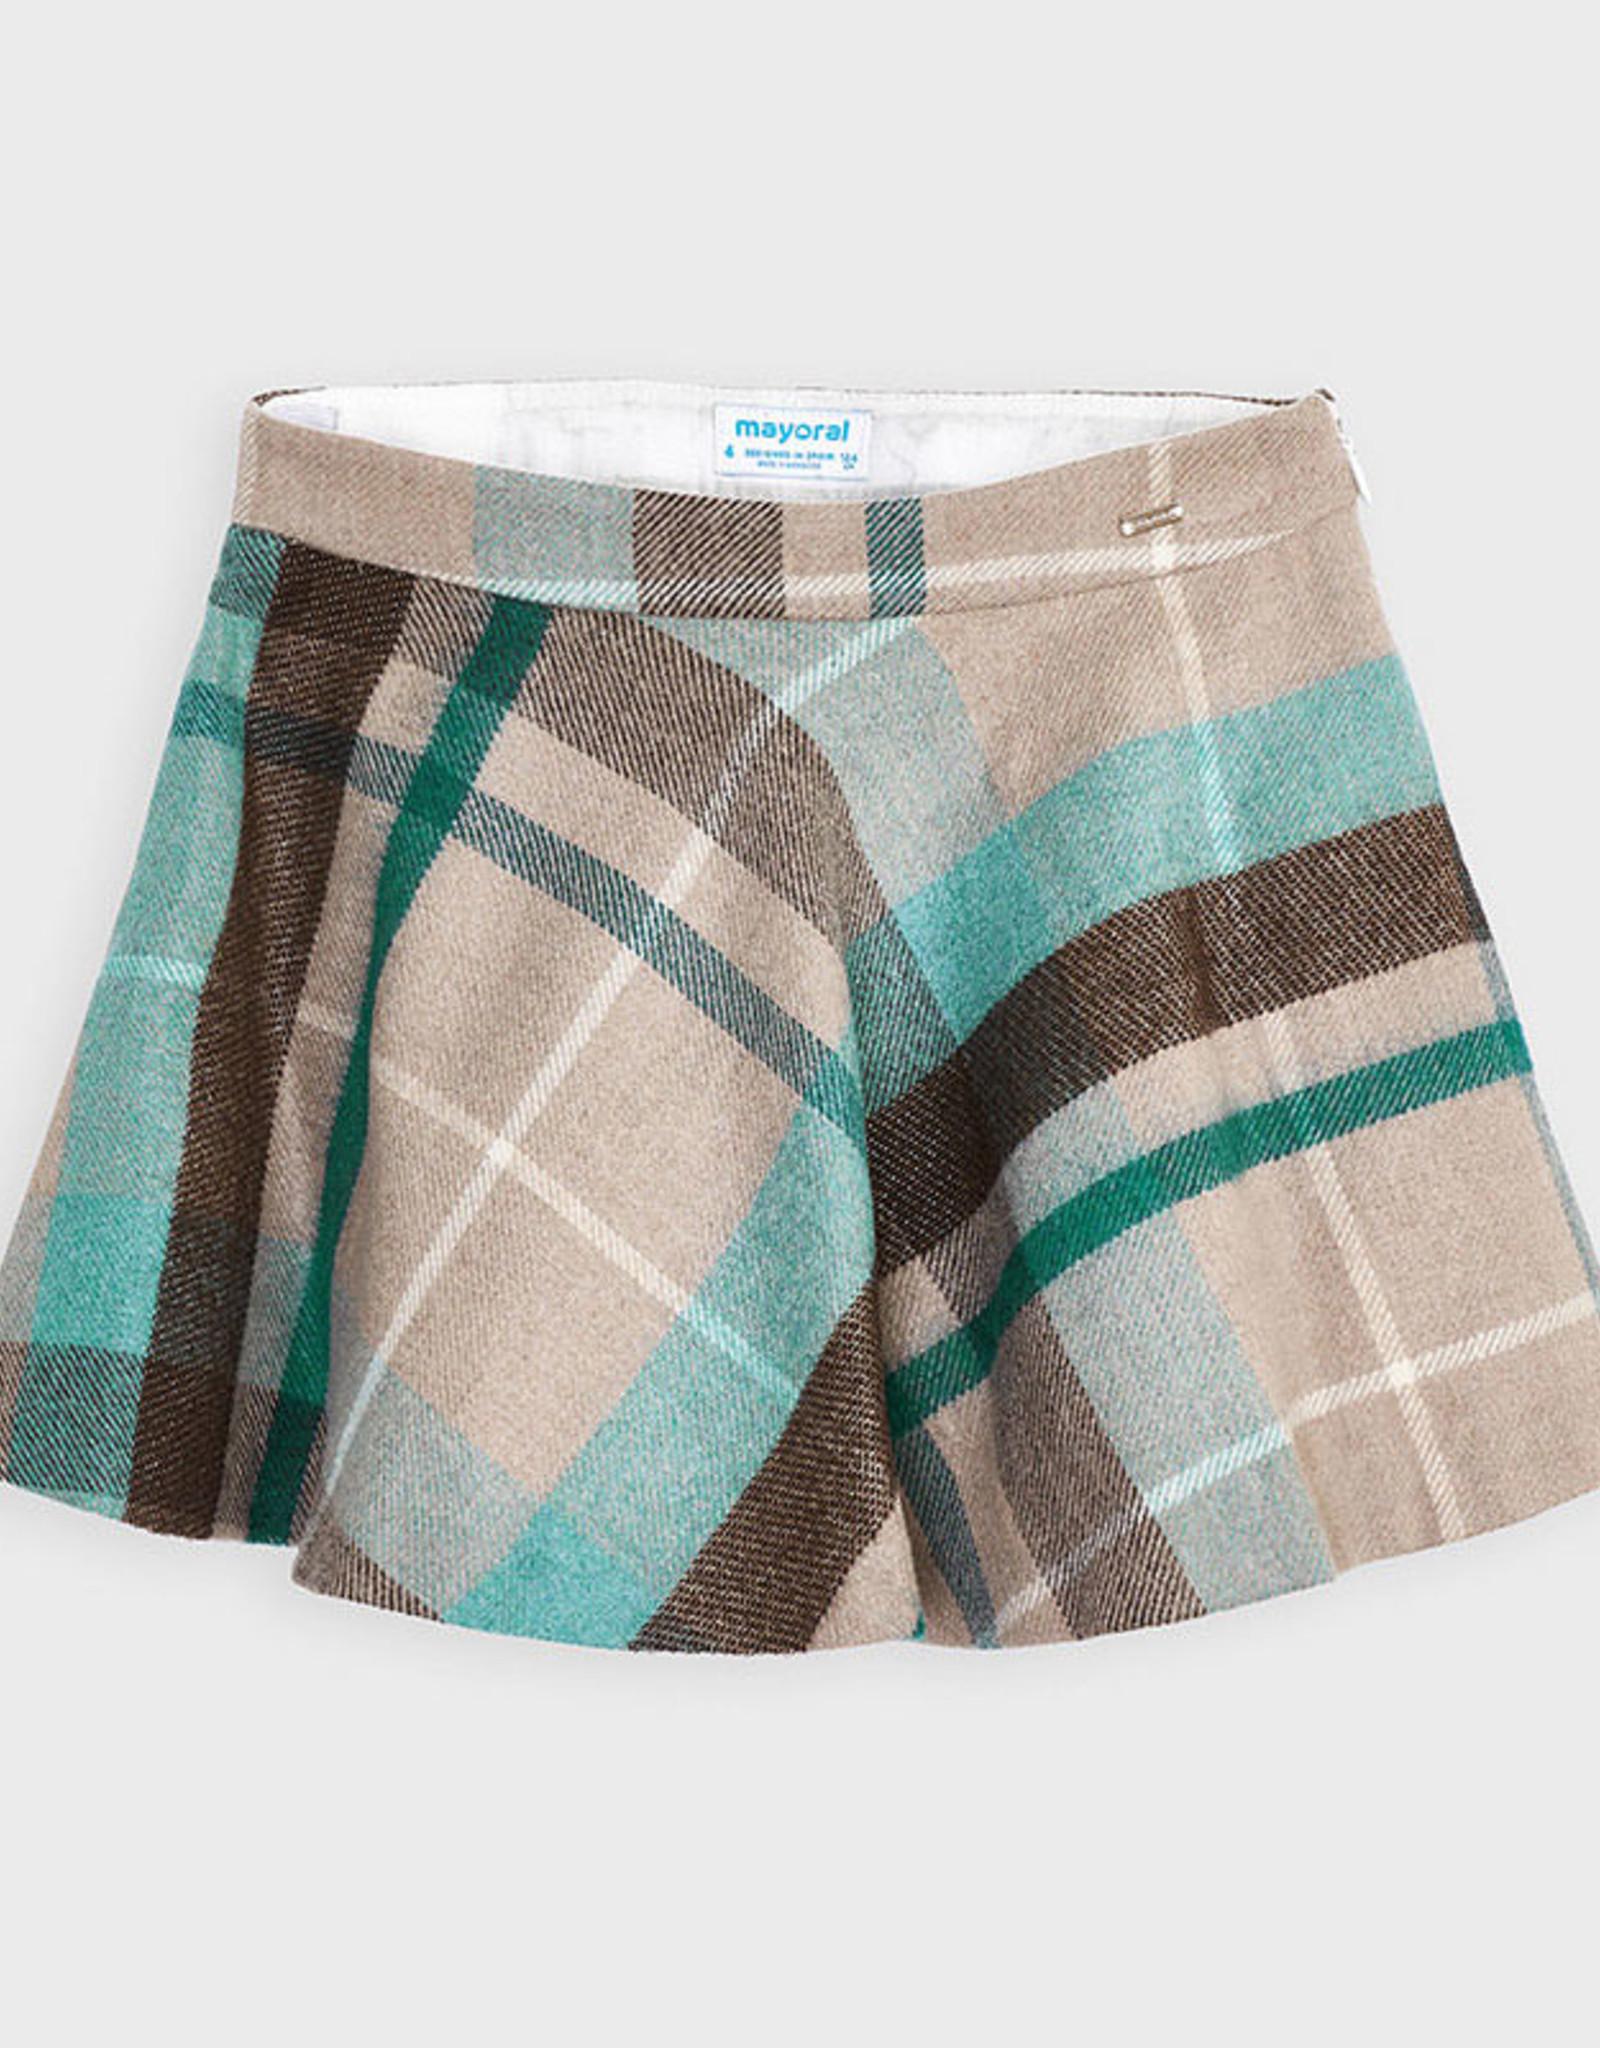 Mayoral FA20 Plaid Skirt